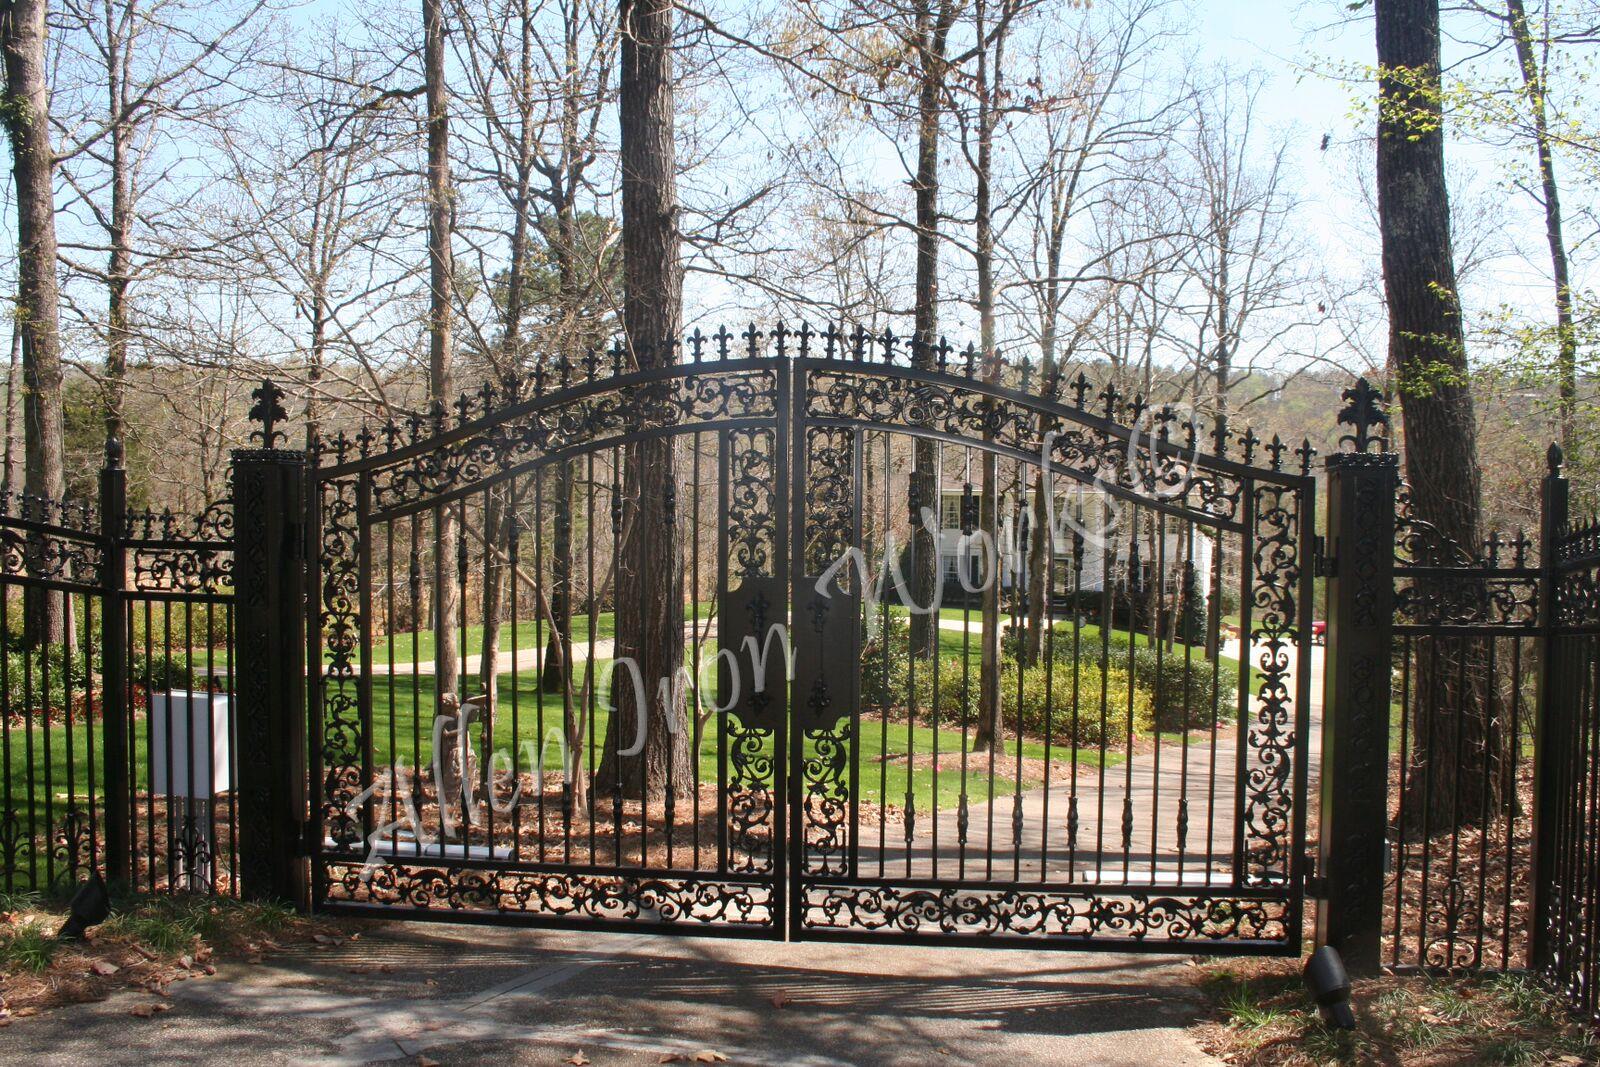 arched-iron-gate-birmingham-al-with-pontalba-cast-iron-designs-and-fleur-de-lis-spears